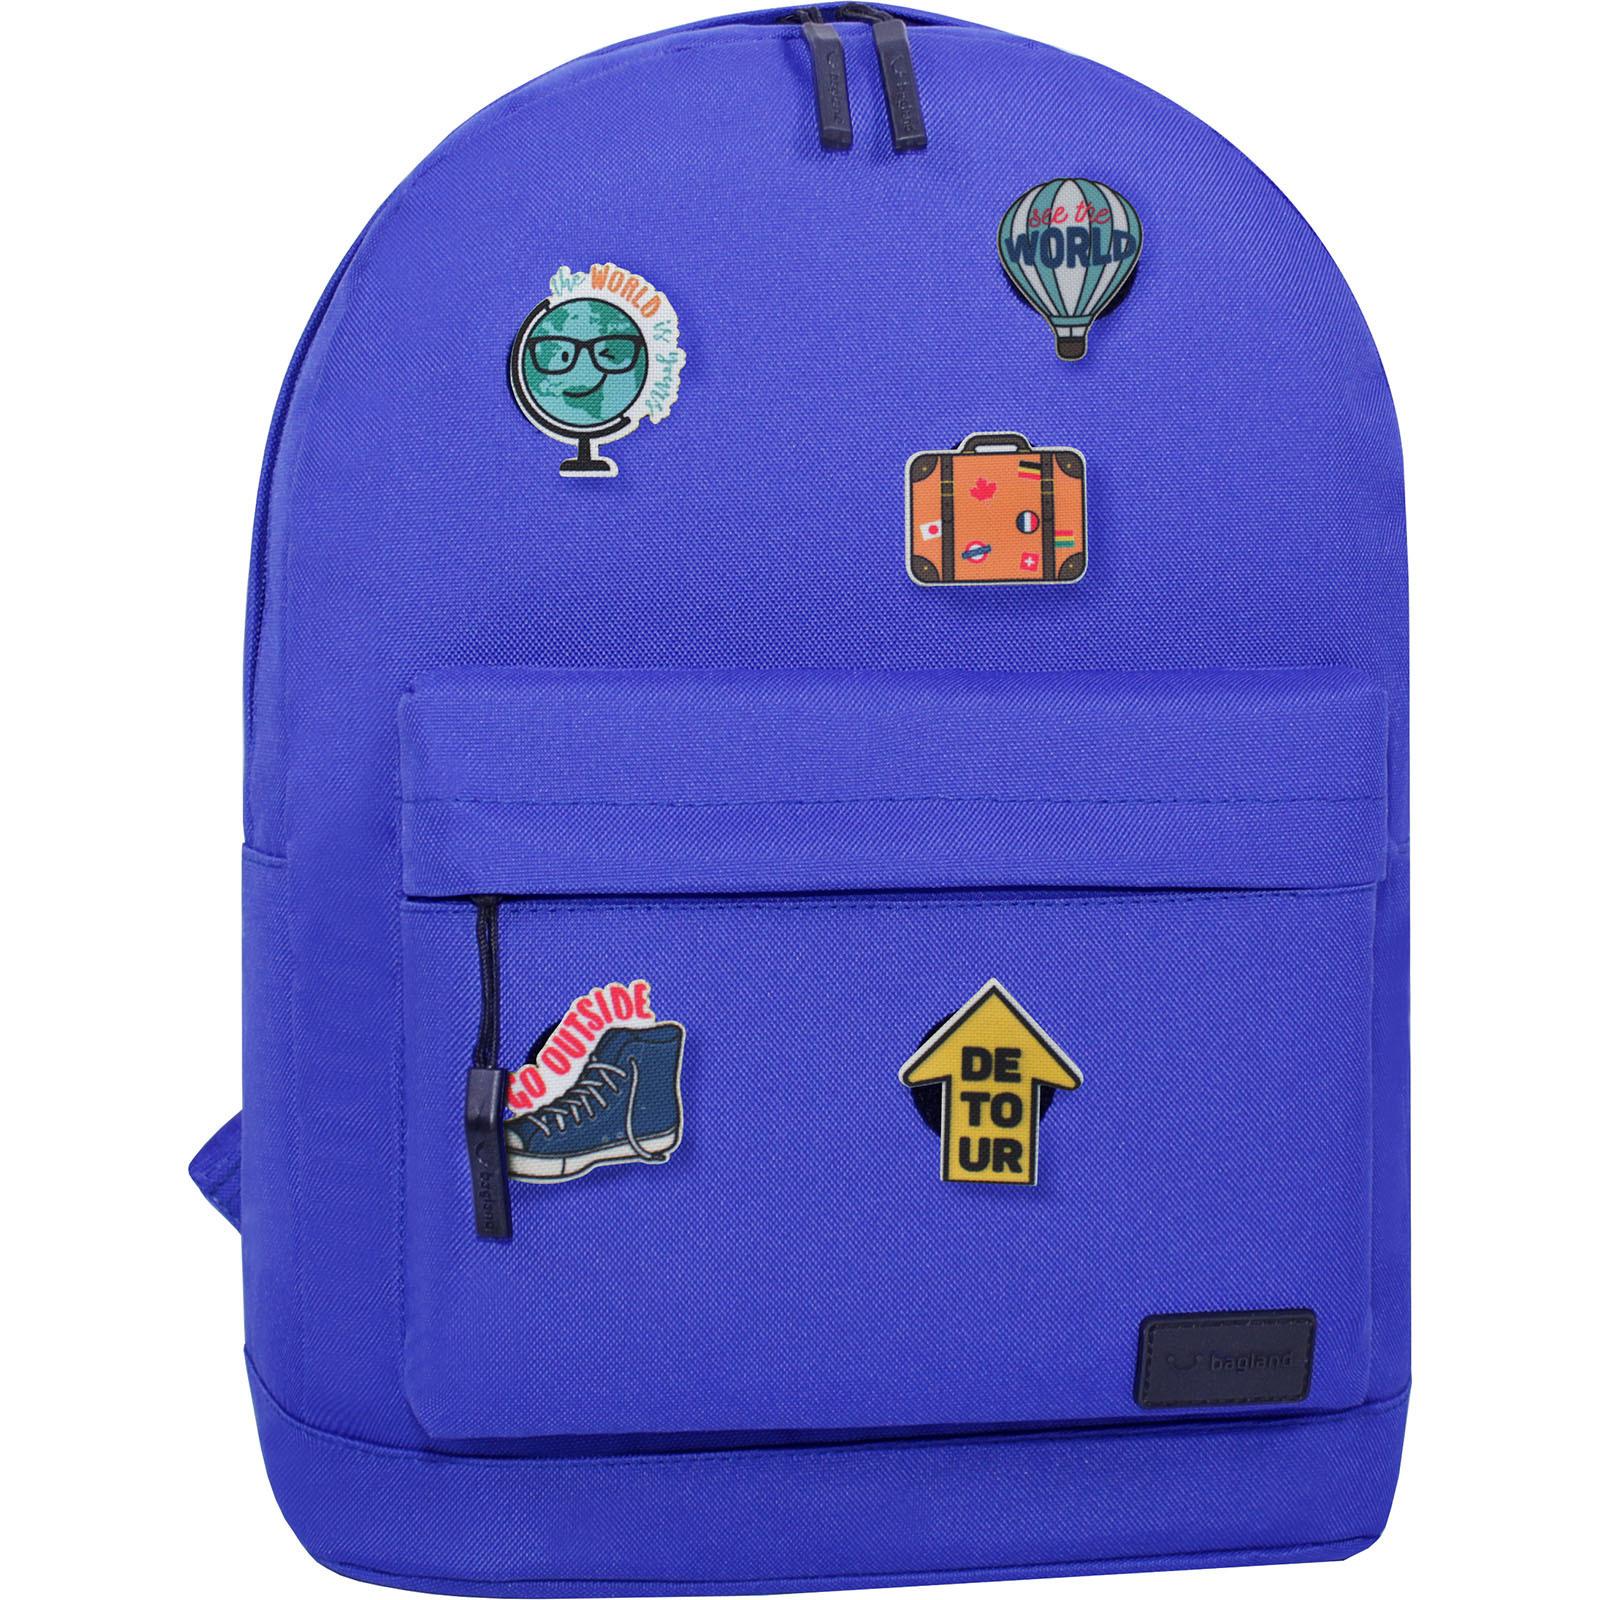 Молодежные рюкзаки Рюкзак Bagland Молодежный W/R 17 л. 223 Электрик  (00533662 Ш) IMG_2942.JPG